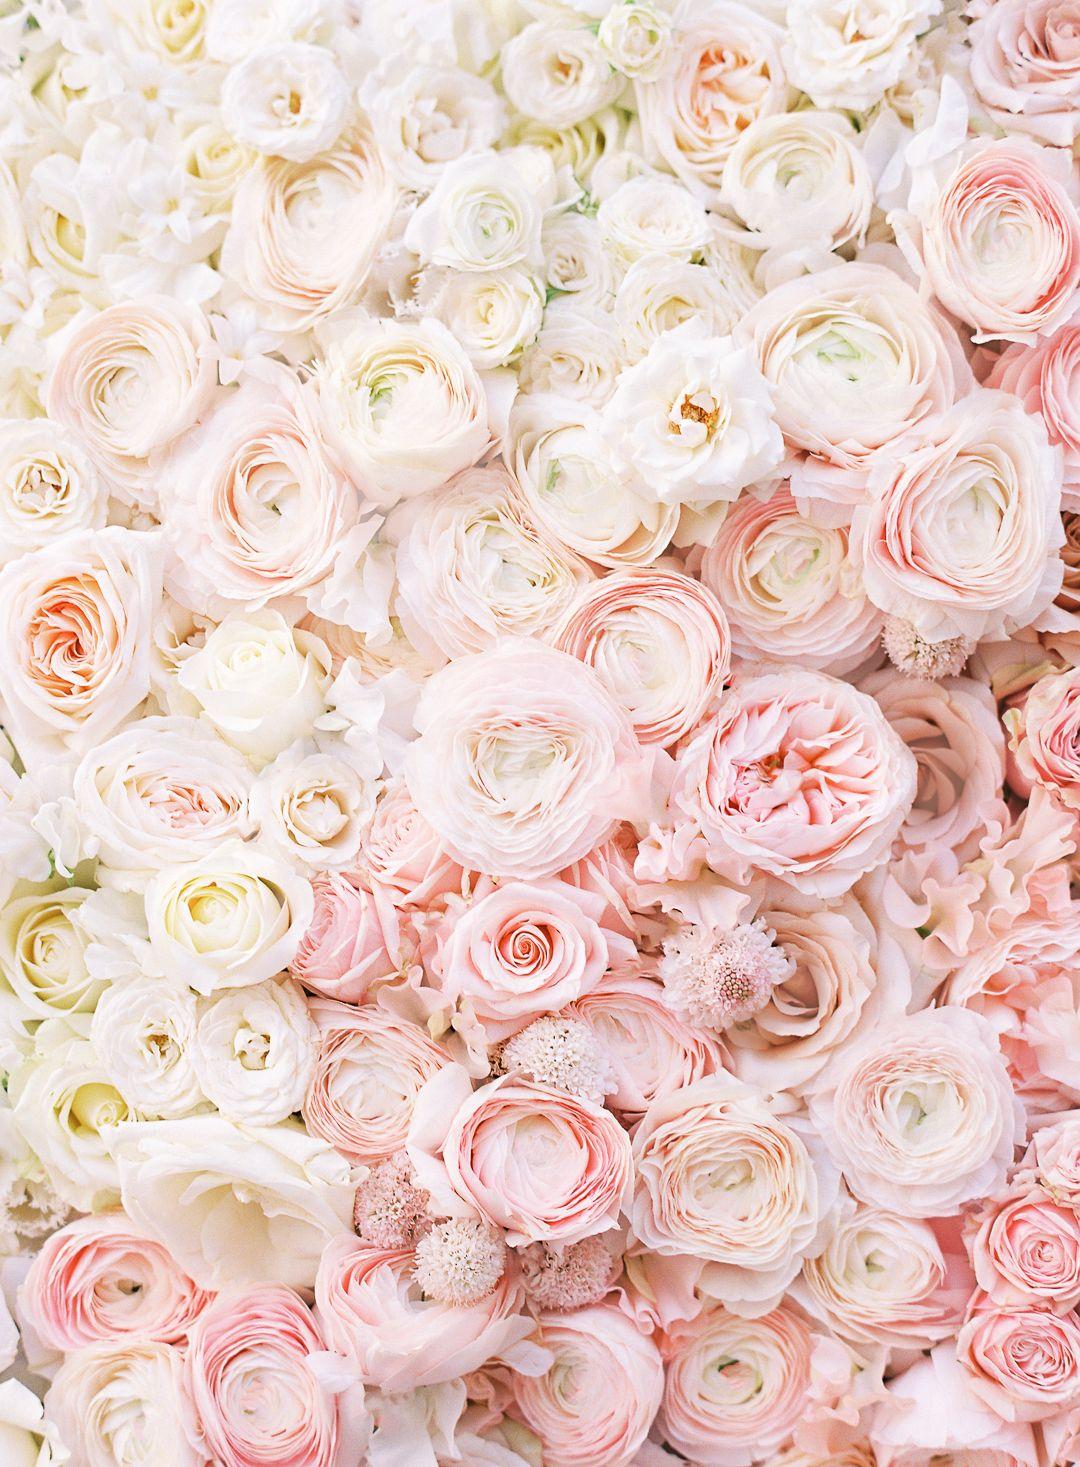 Introducing neutral flower series flower fine art prints and art